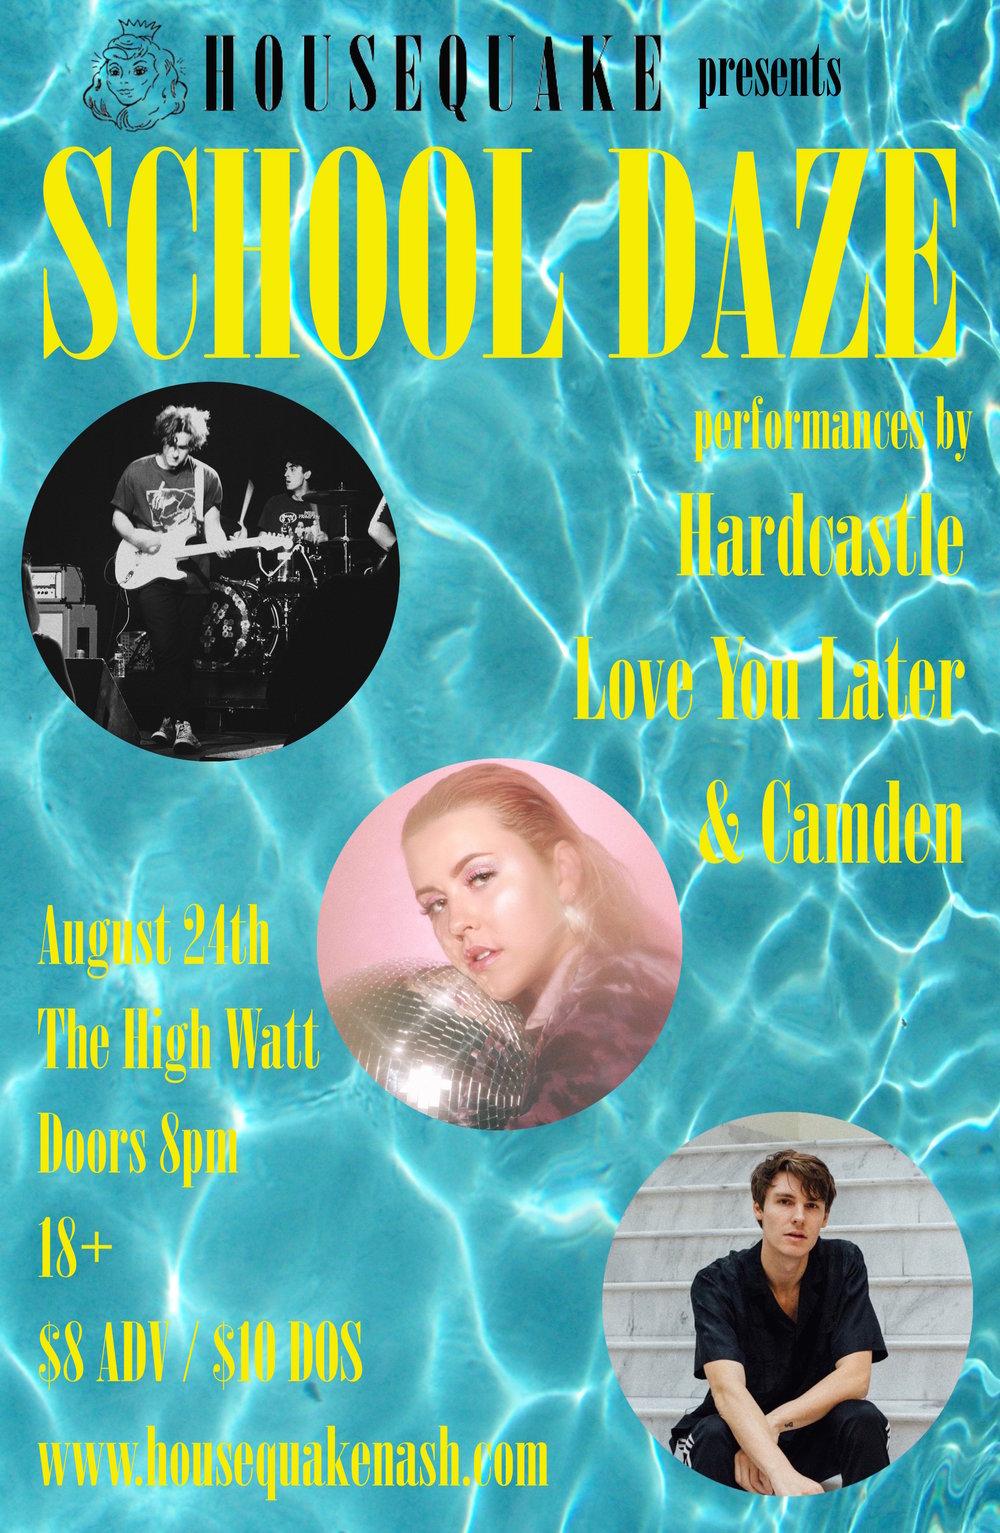 school daze poster.jpg